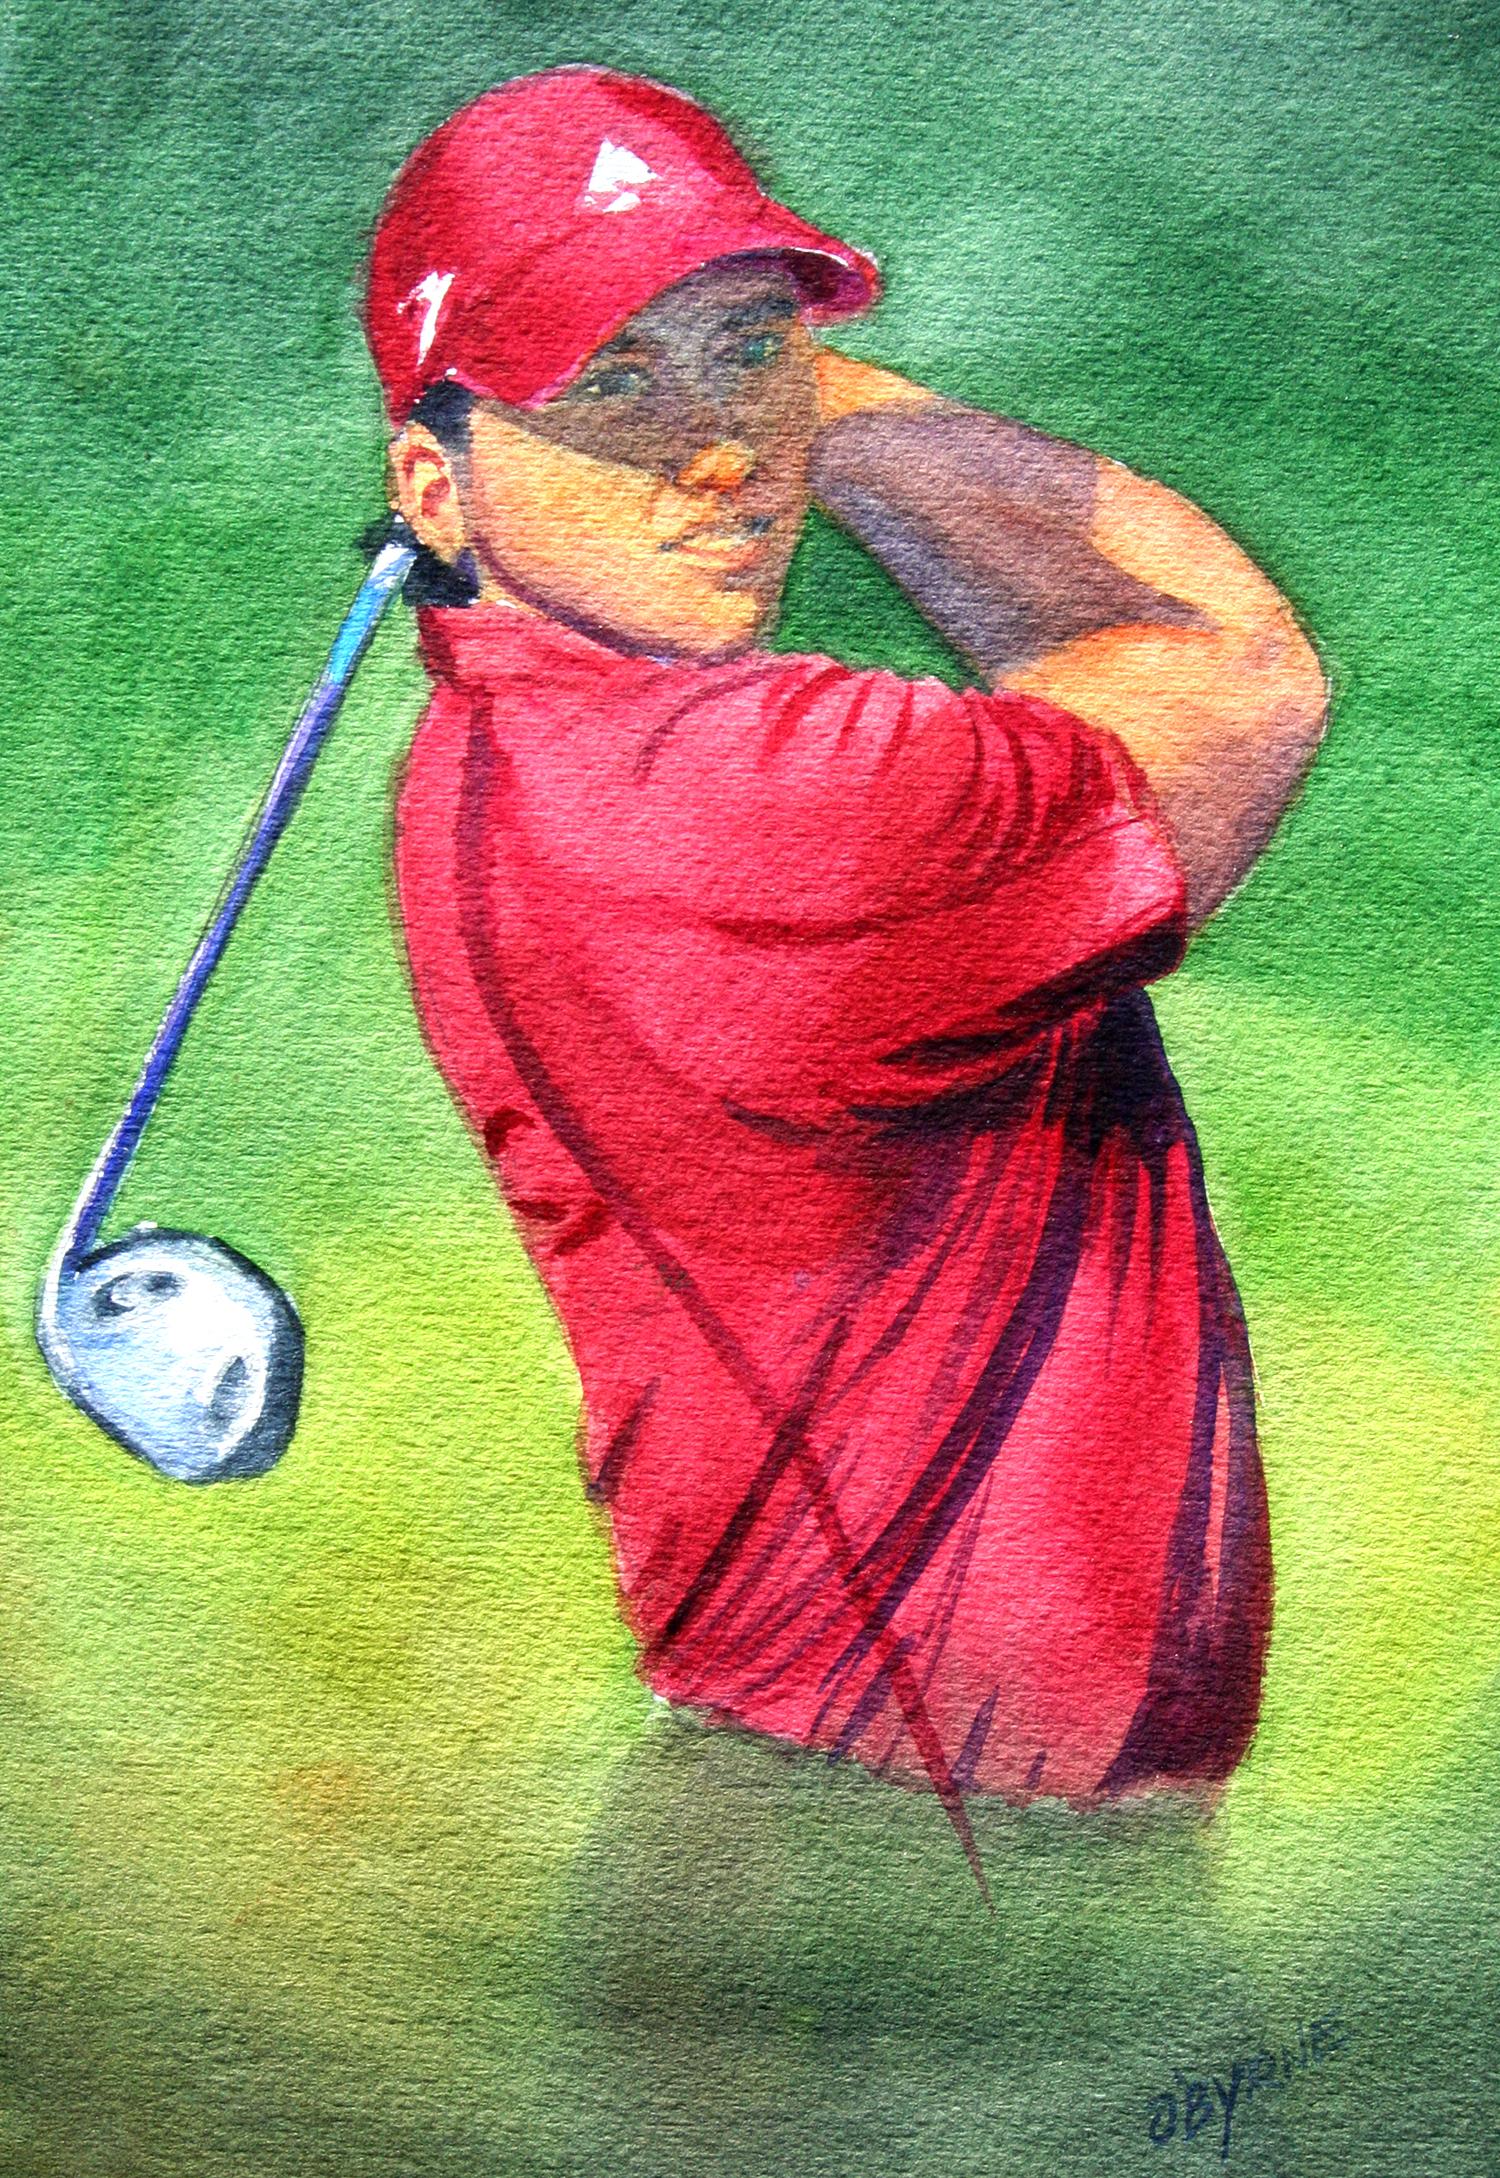 Golfer_1500.jpg